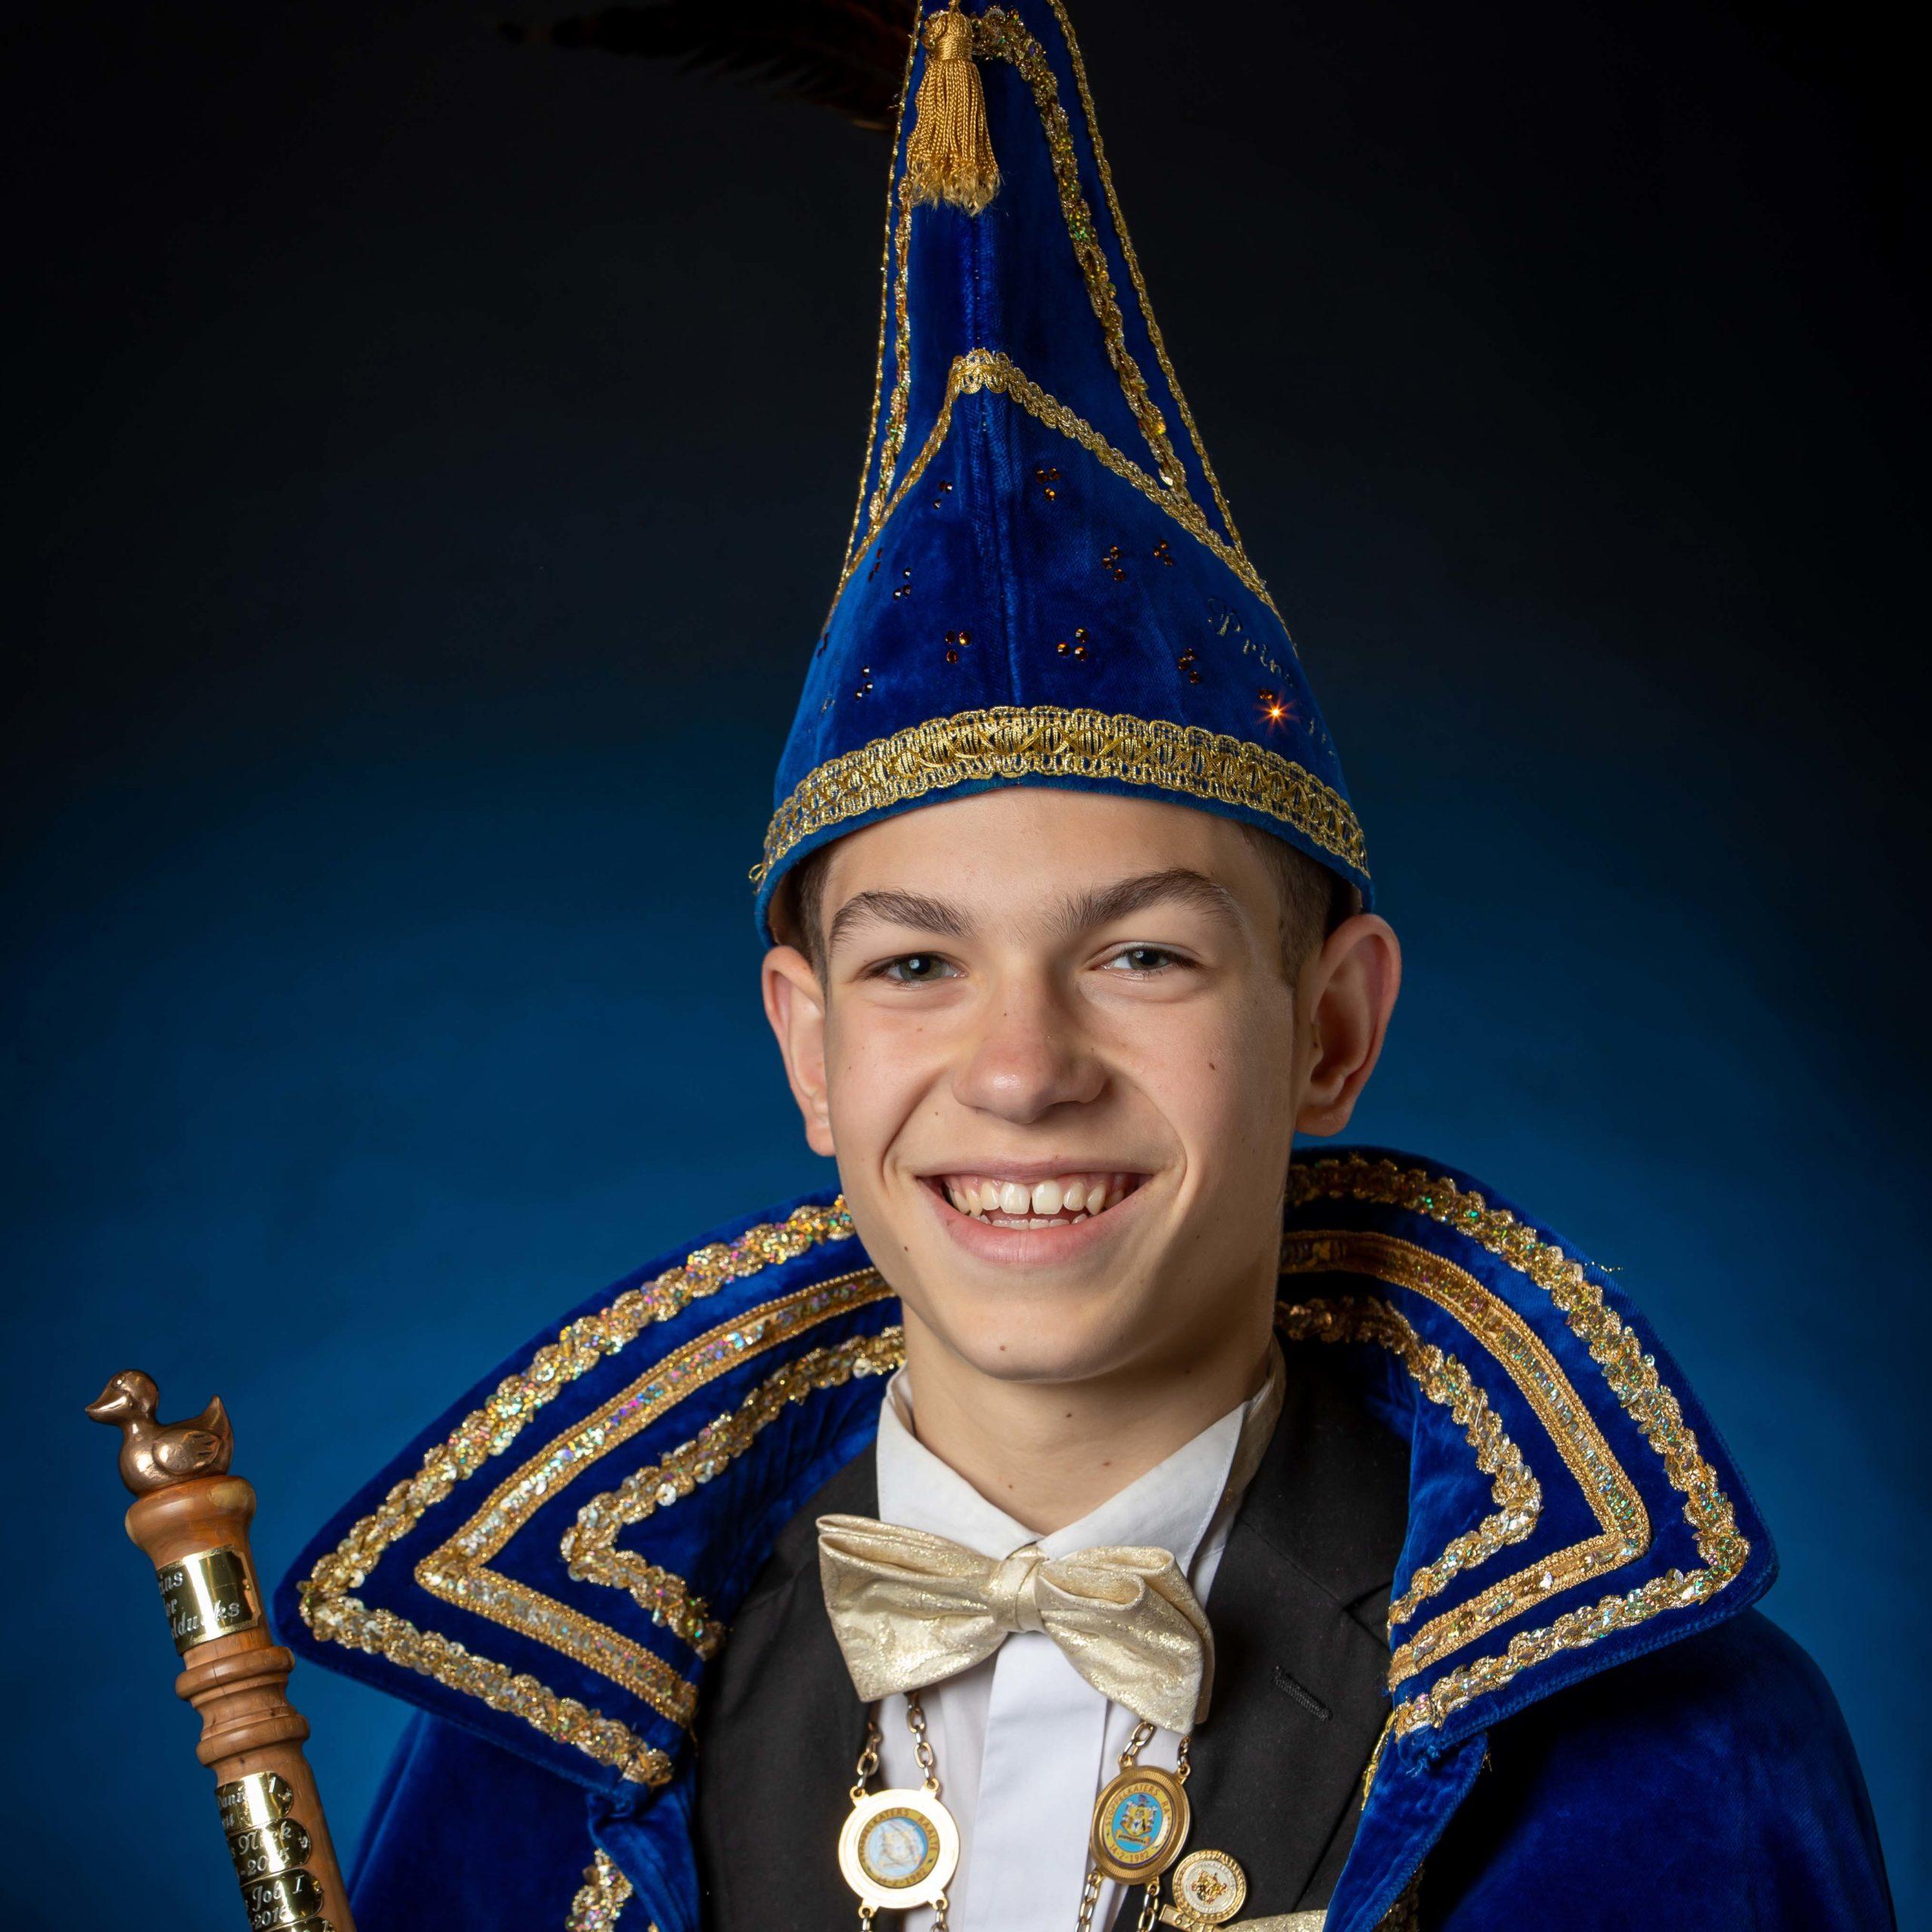 Prins Fabian I